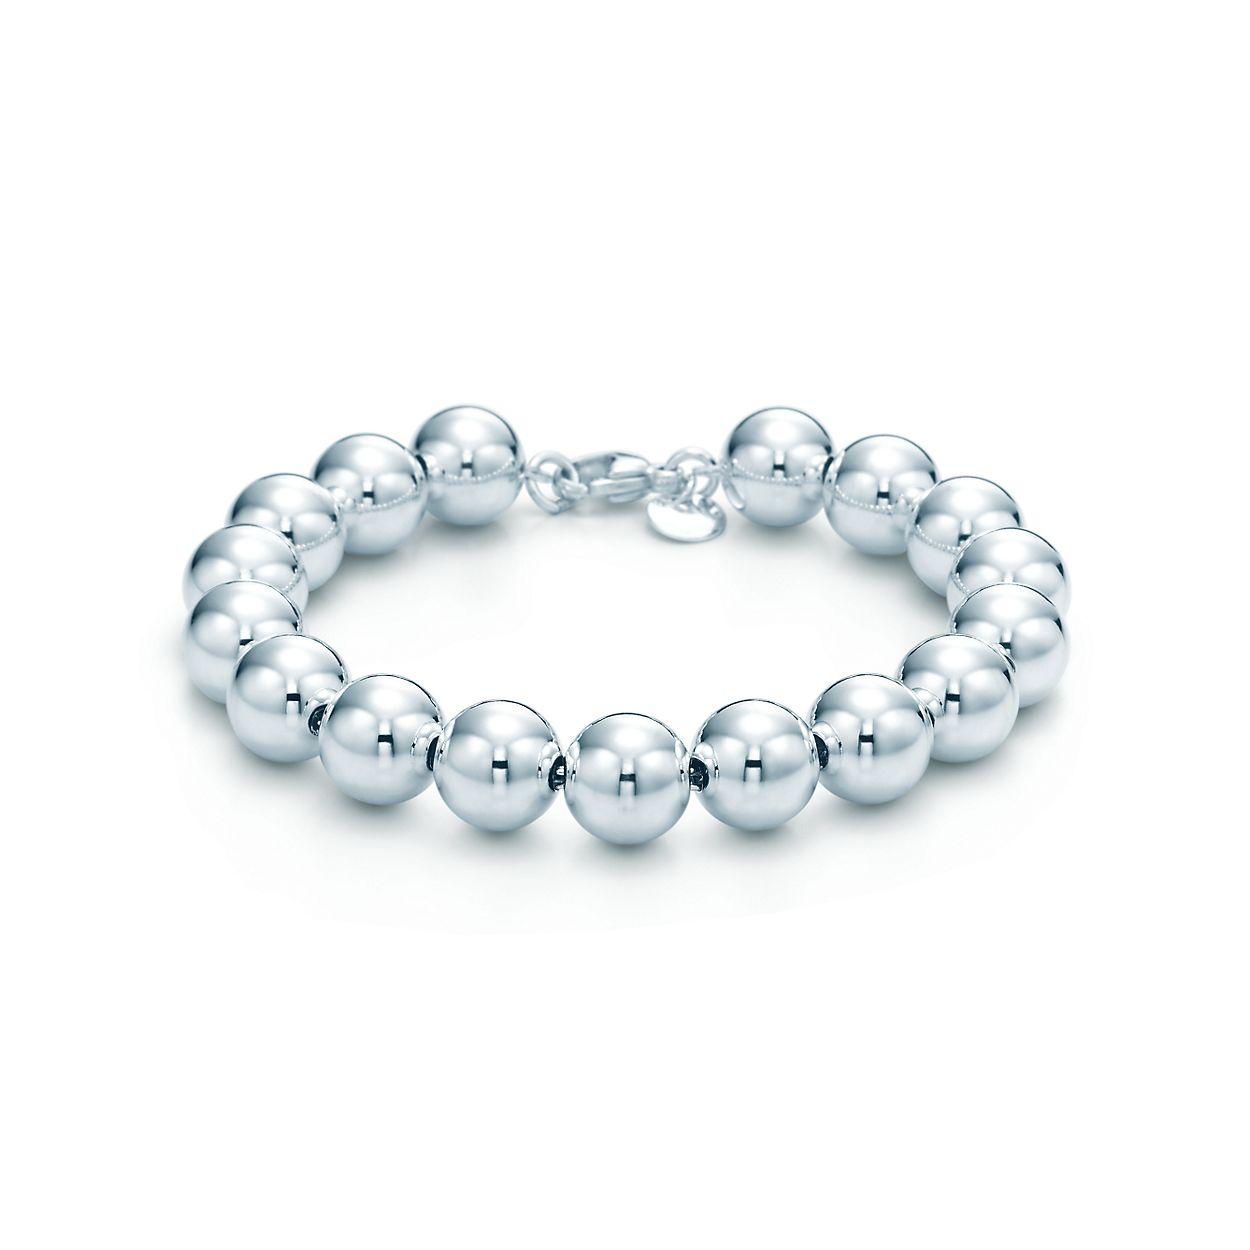 Elsa Peretti five-charm bracelet in sterling silver - Size 8.25 in Tiffany & Co. BTc2vt9bda